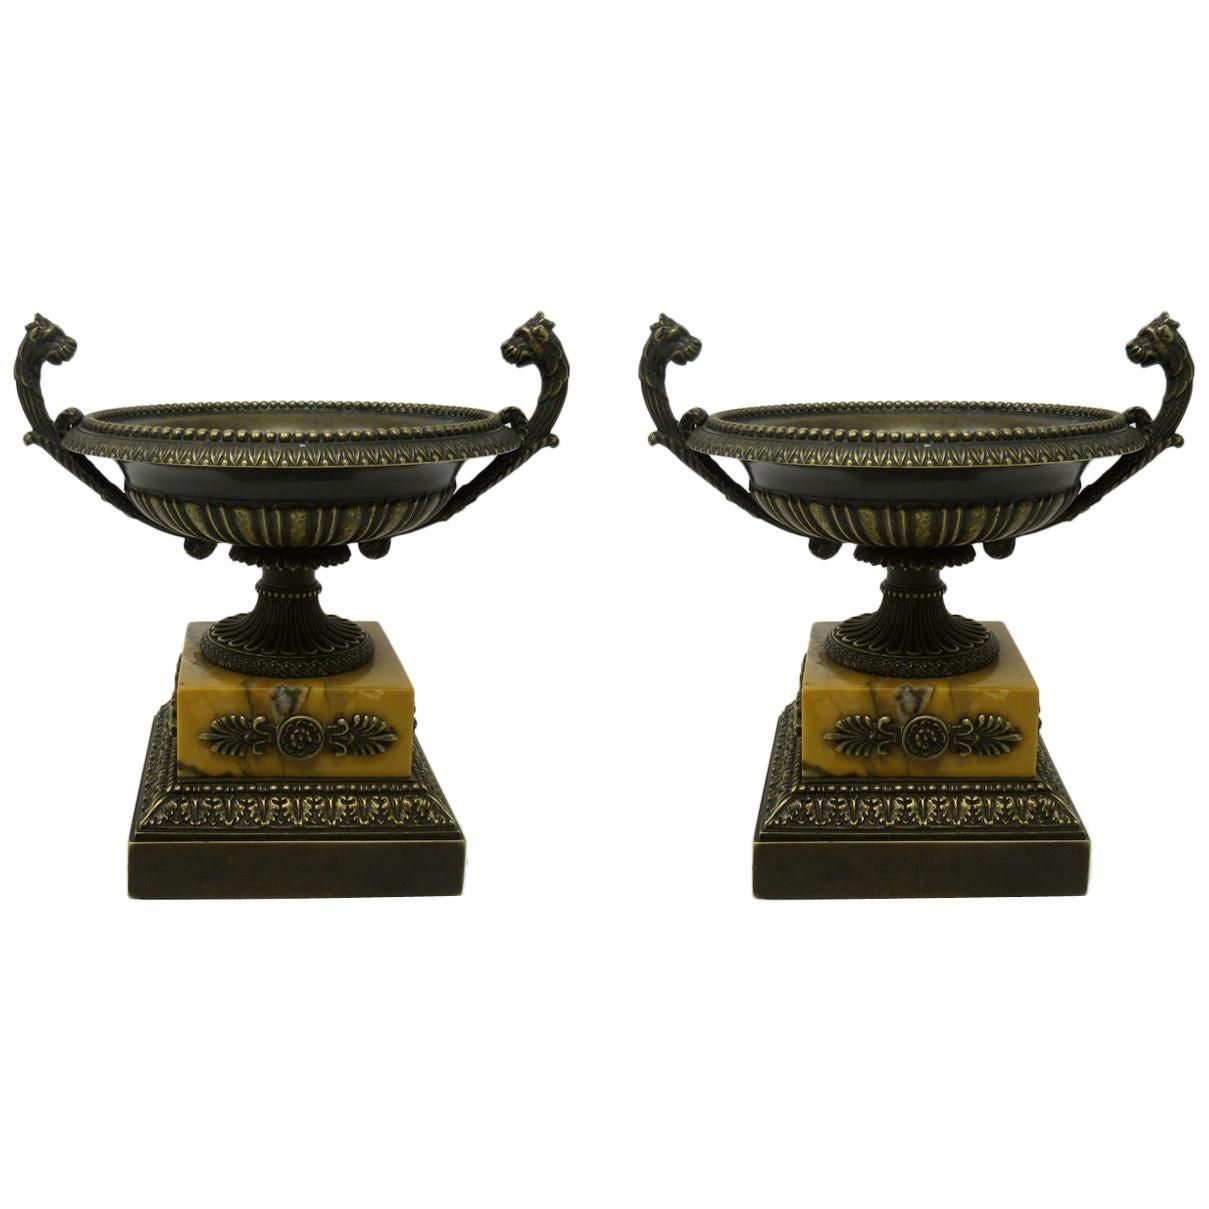 Pair of Grand Tour Ormolu Bronze Sienna Marble Tazzas Urns Vases, 19th Century